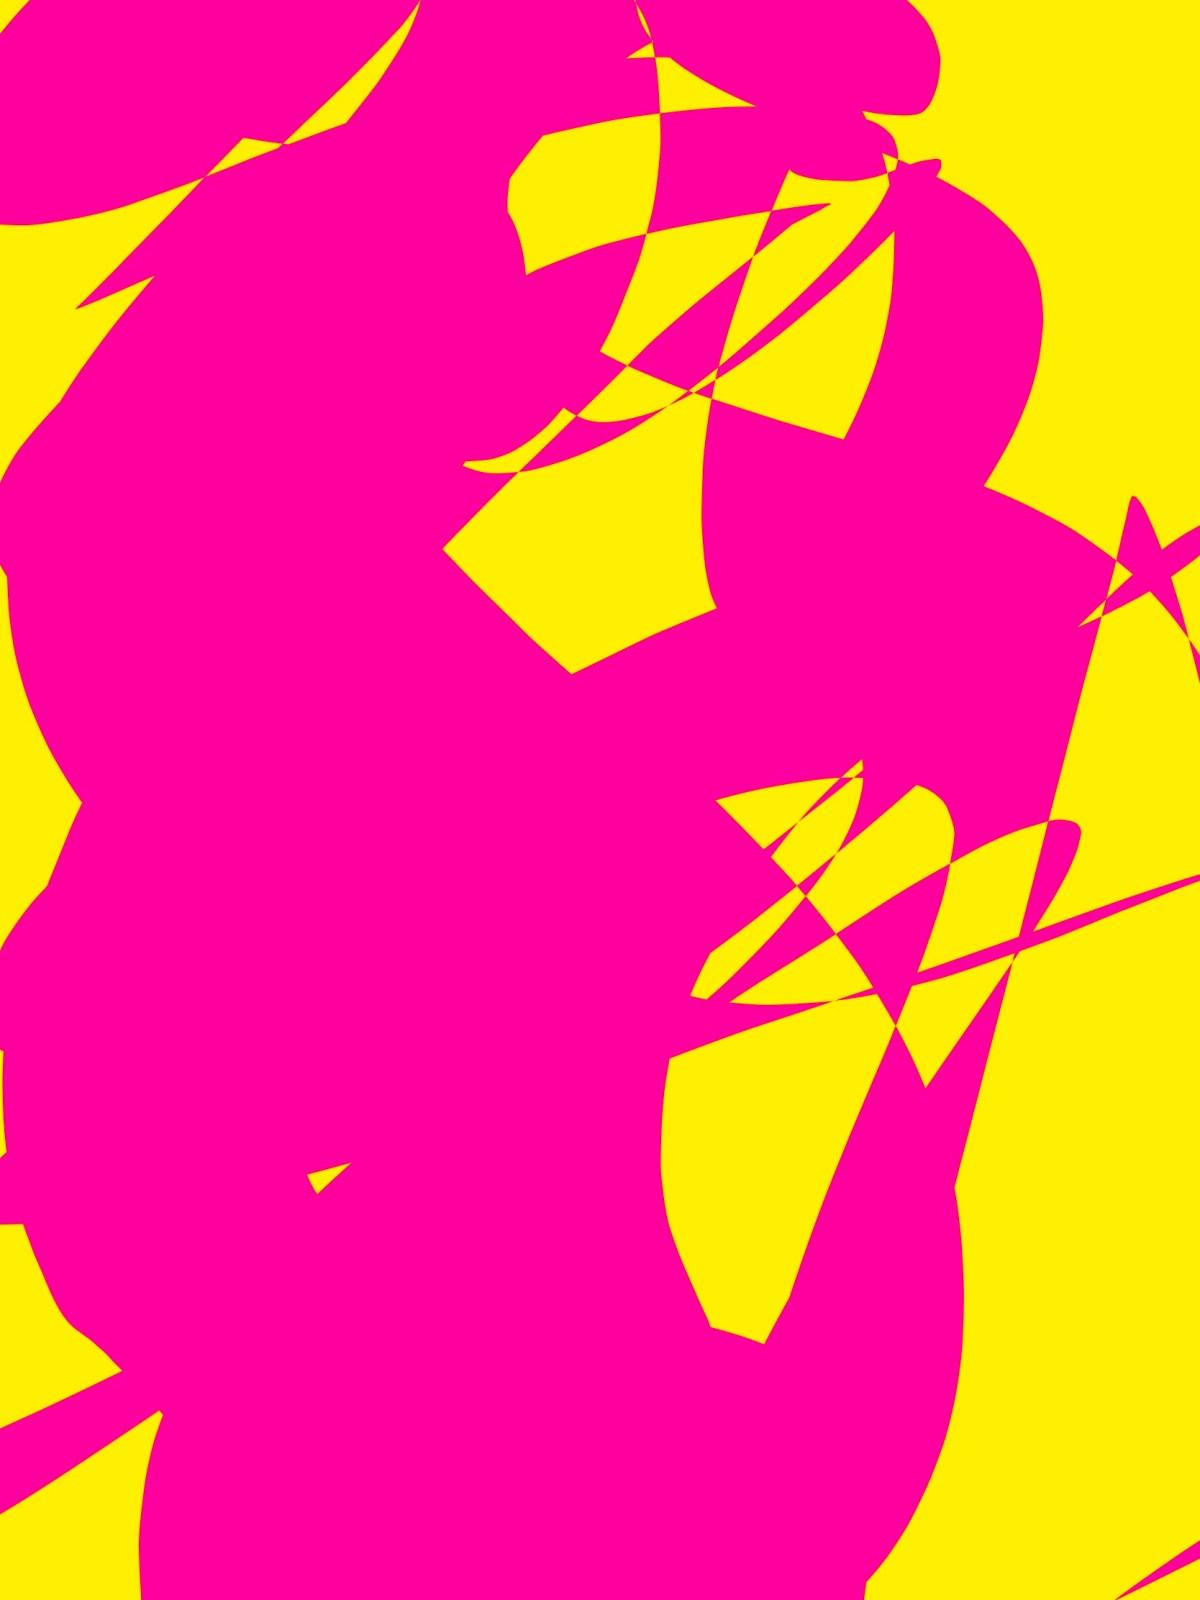 pink yellow abstract ERIC KIM